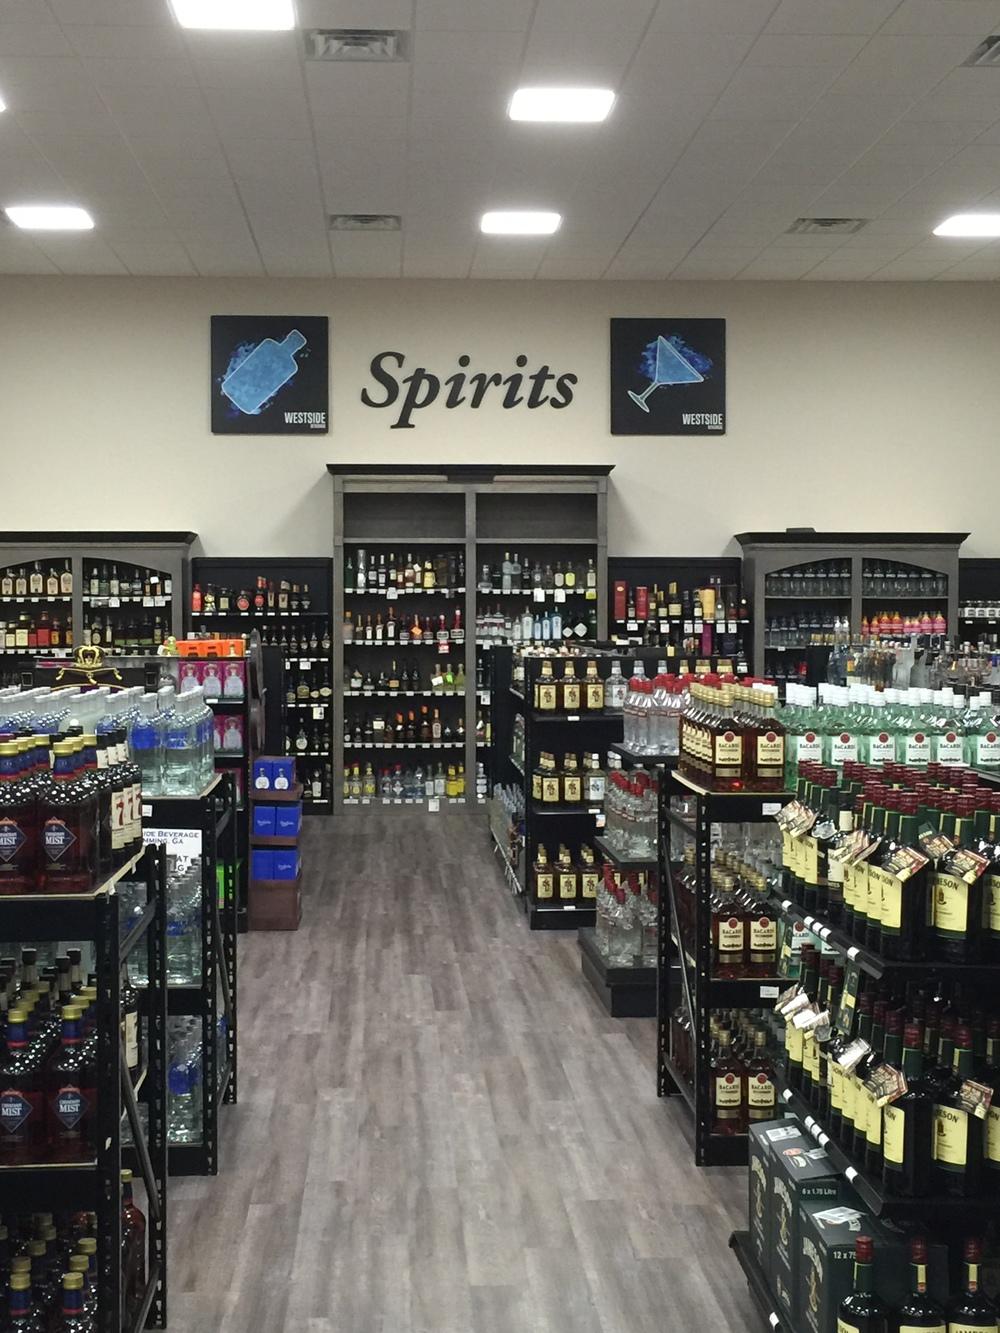 westside beverage liquor and spirits selection in cumming georgia